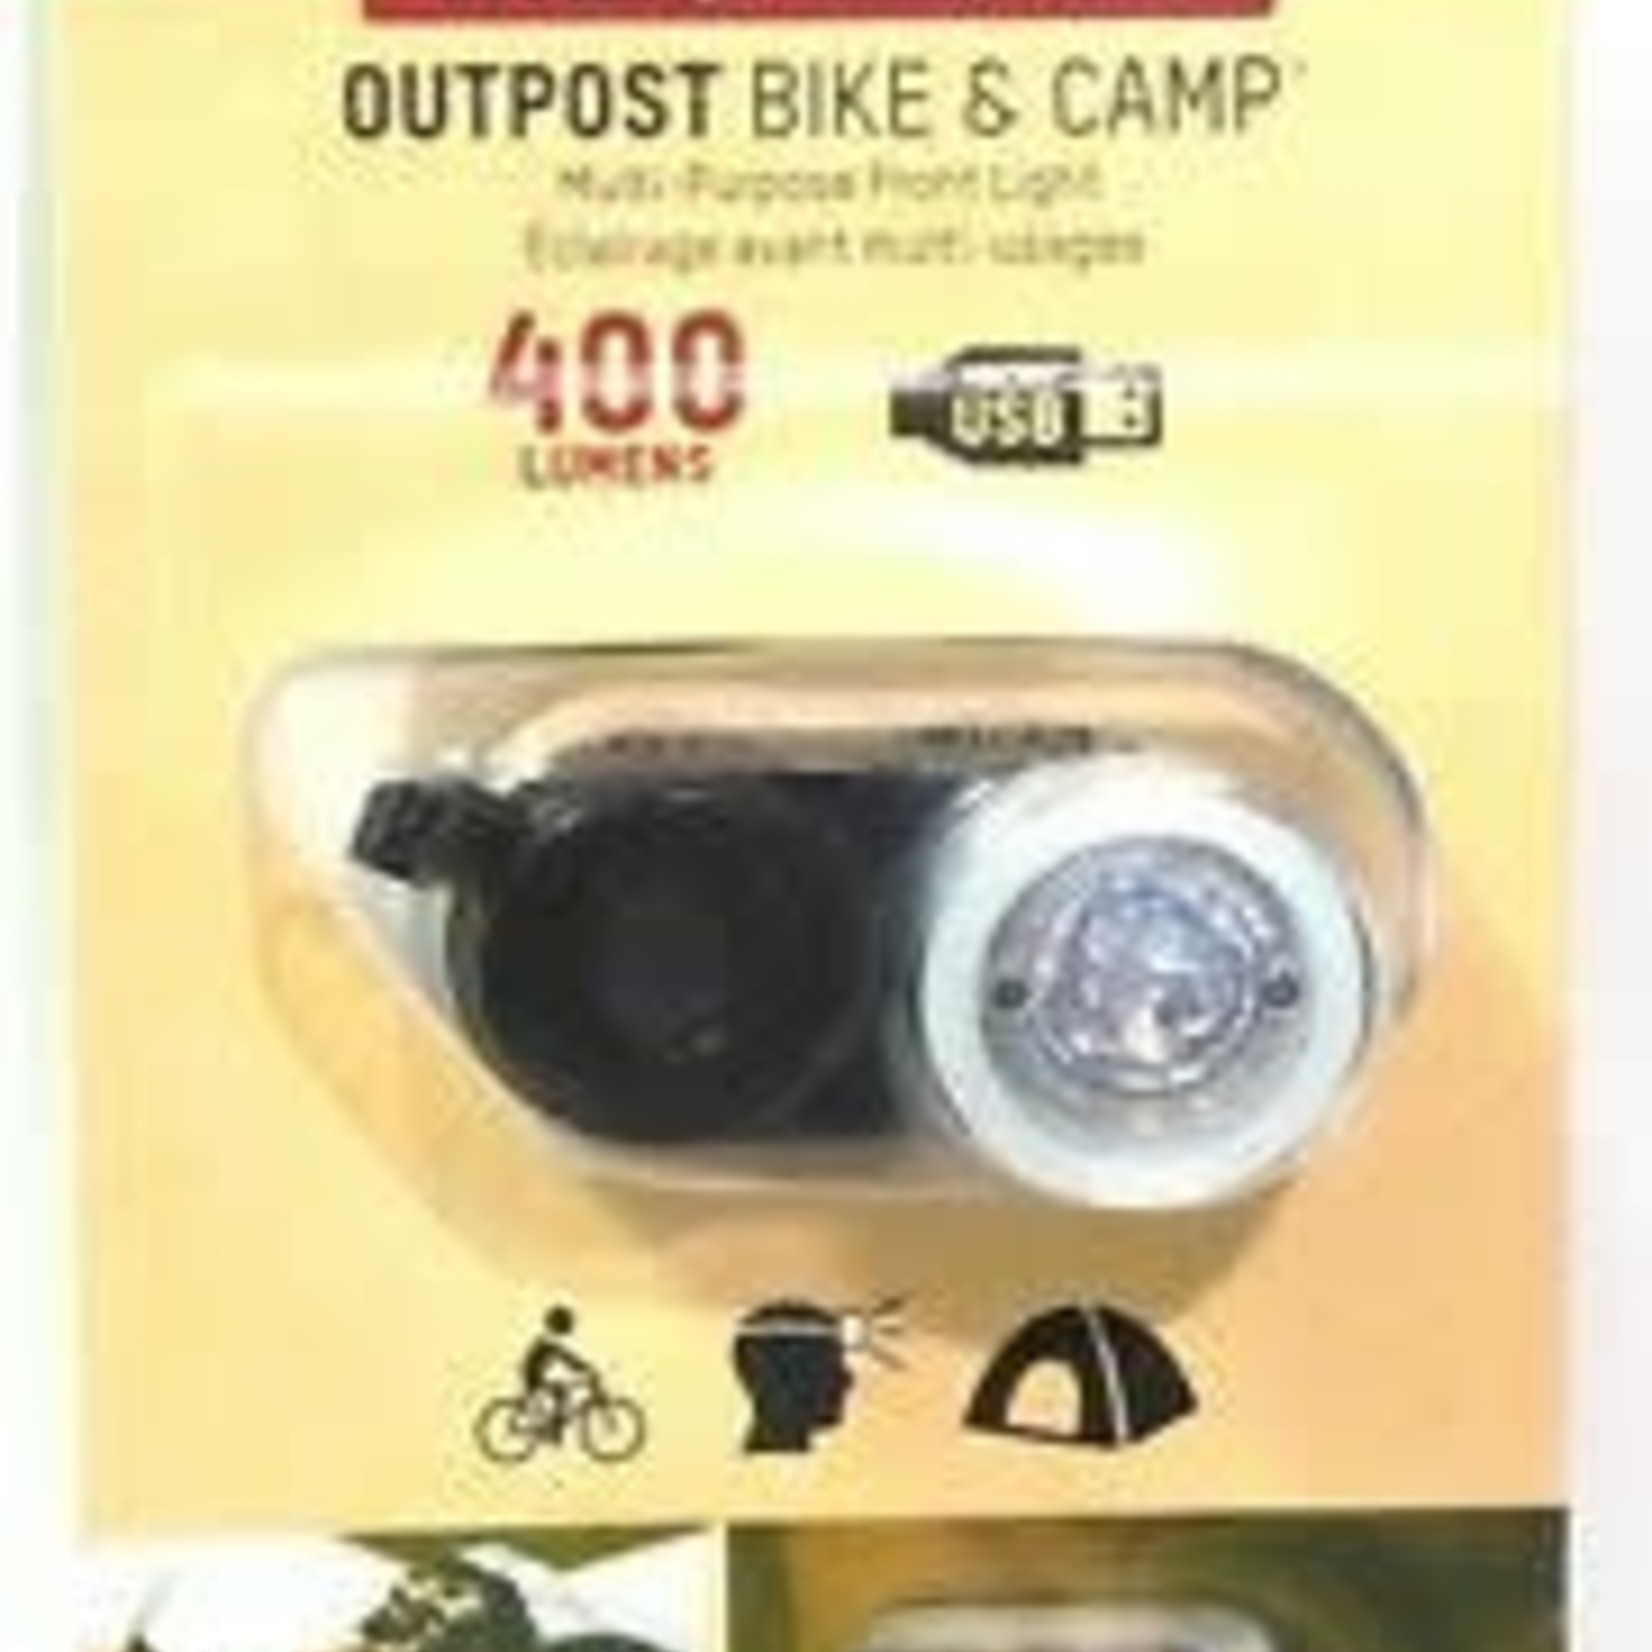 BB OUTPOST BIKE & CAMP